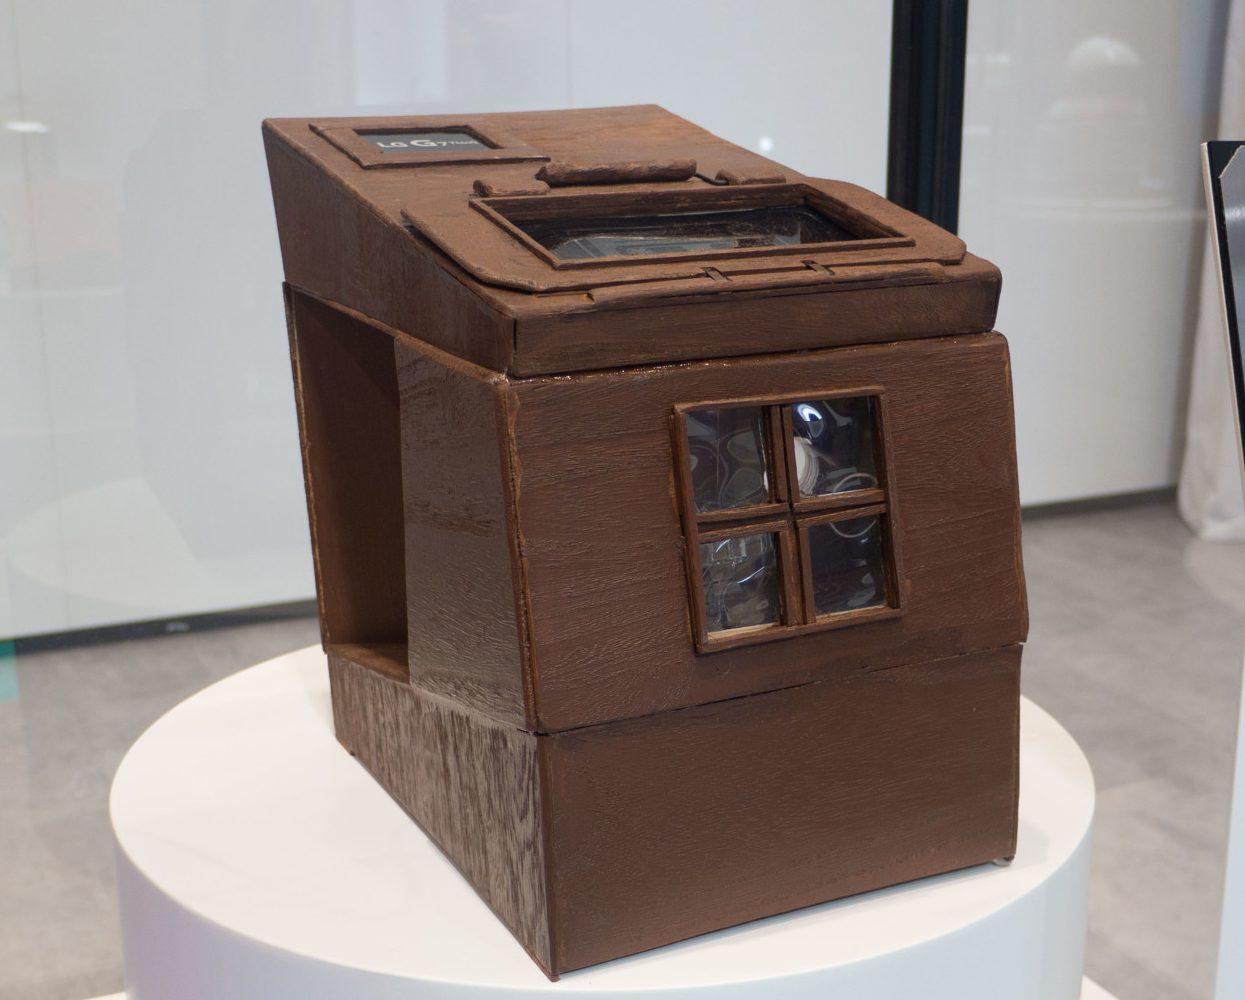 LG G7 boombox speaker